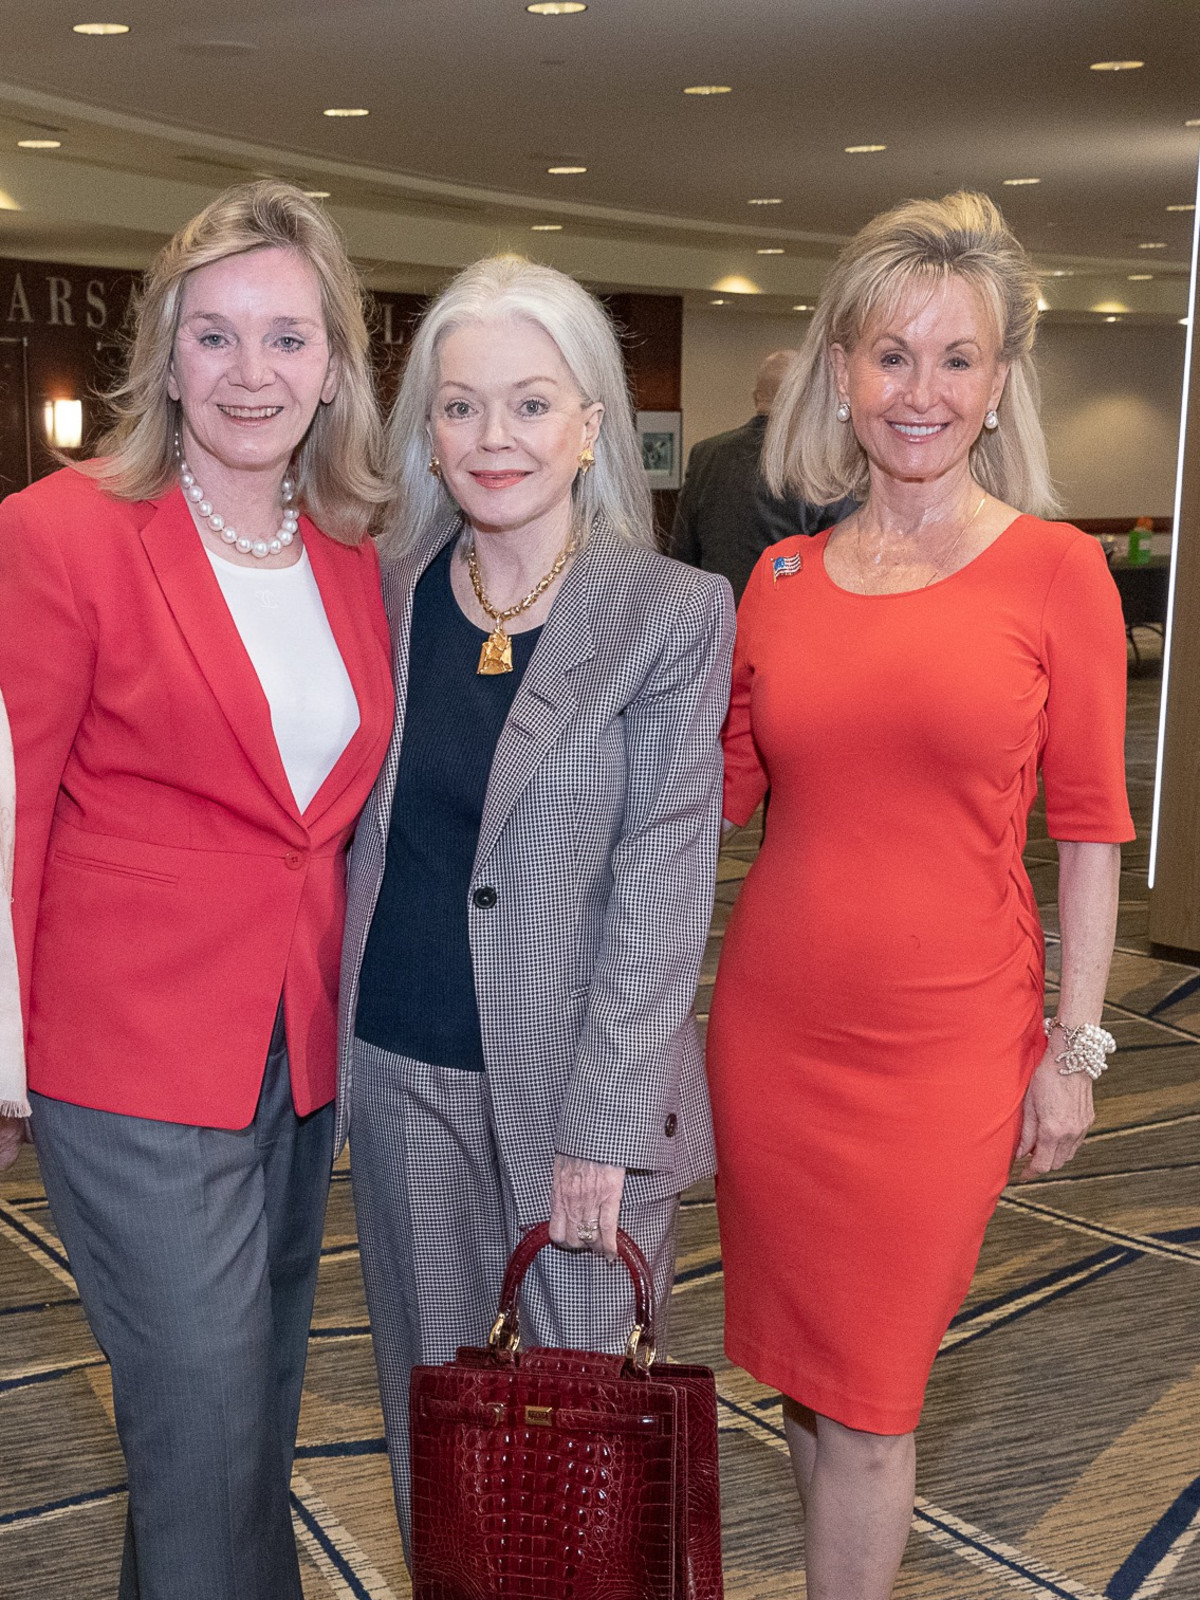 Gaile Cook, Lynne Sheldon, Toni Brinker